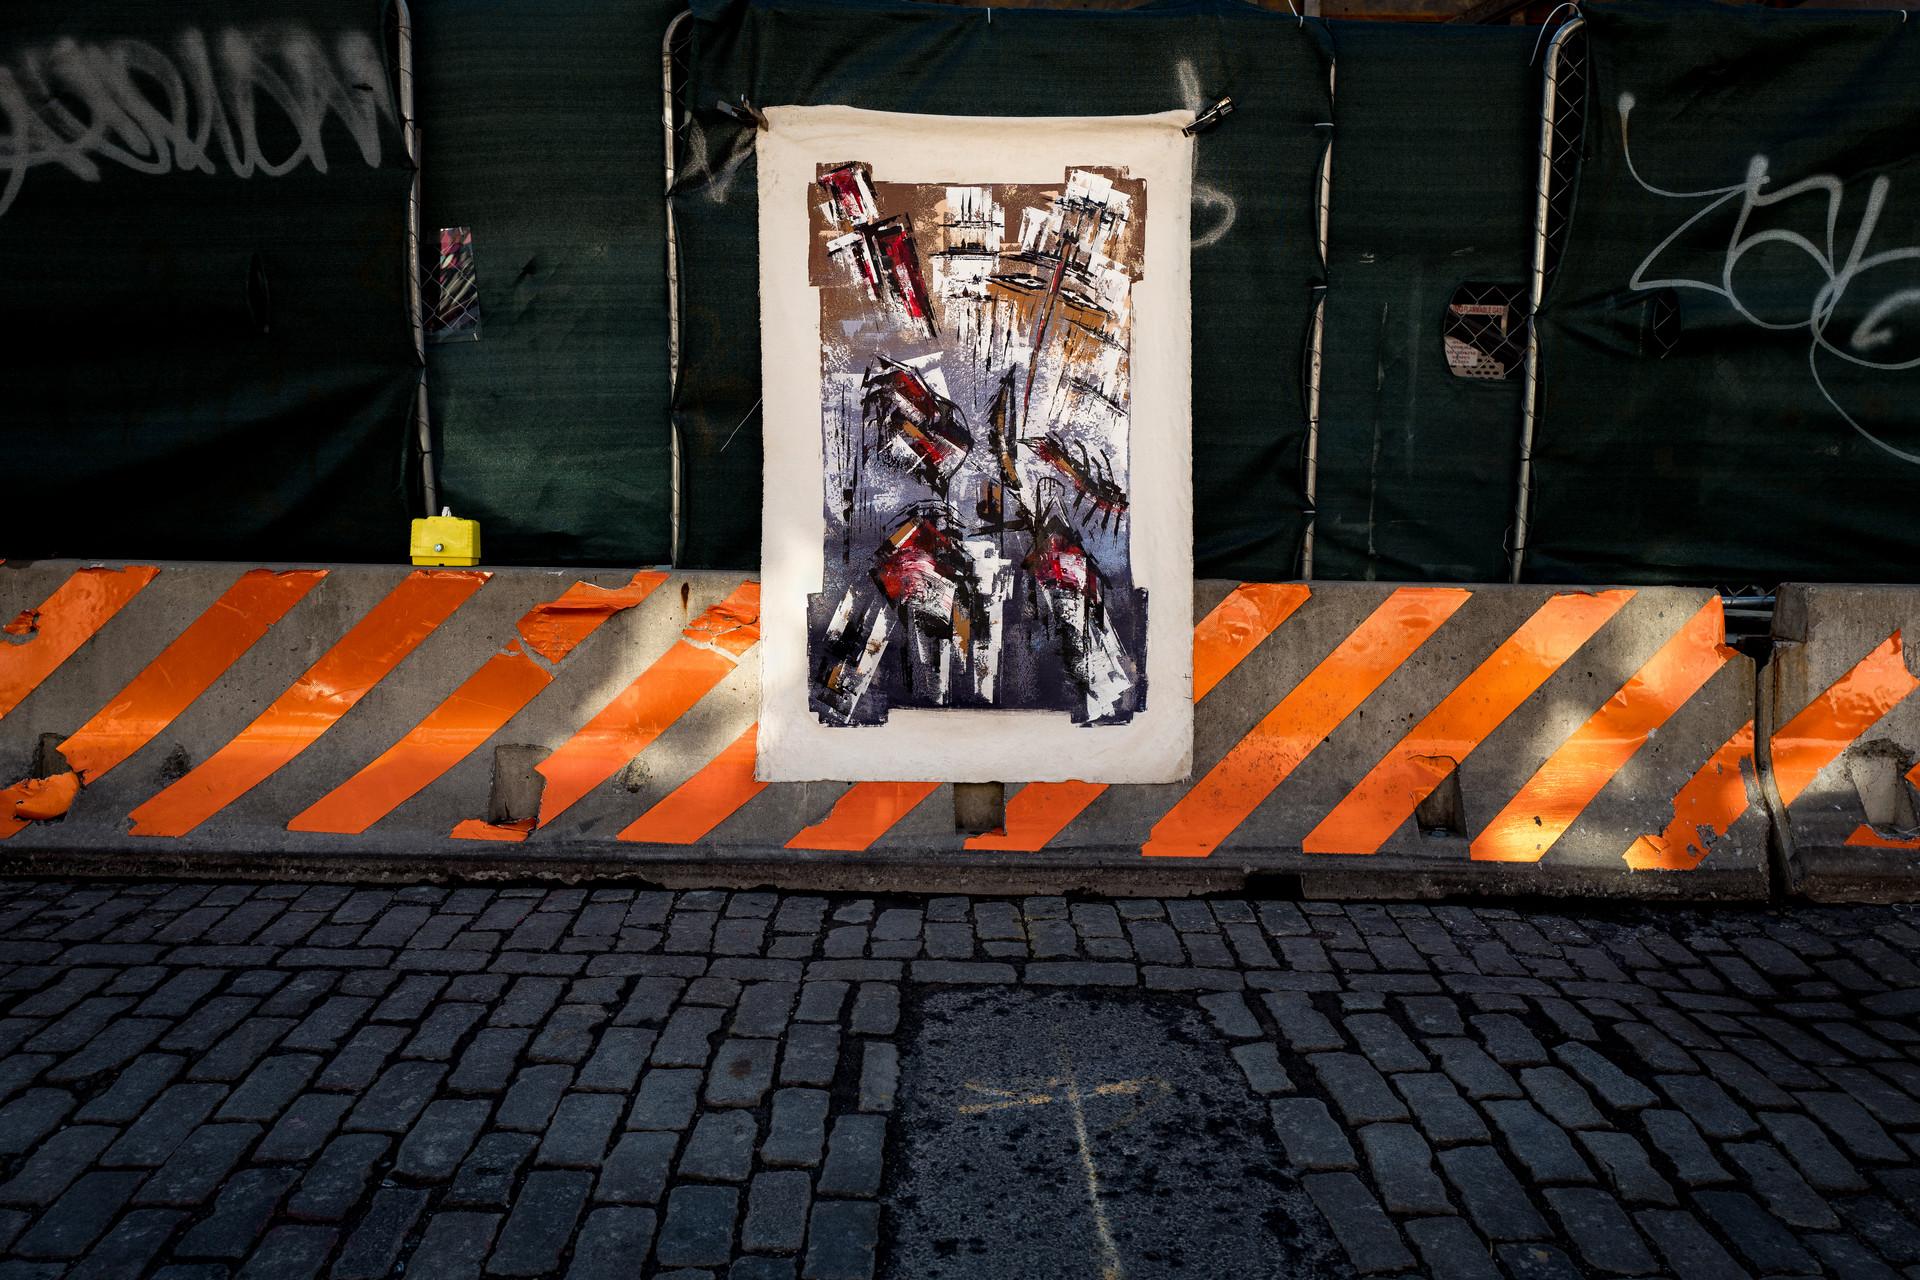 20181229-new york-163-Edit.jpg